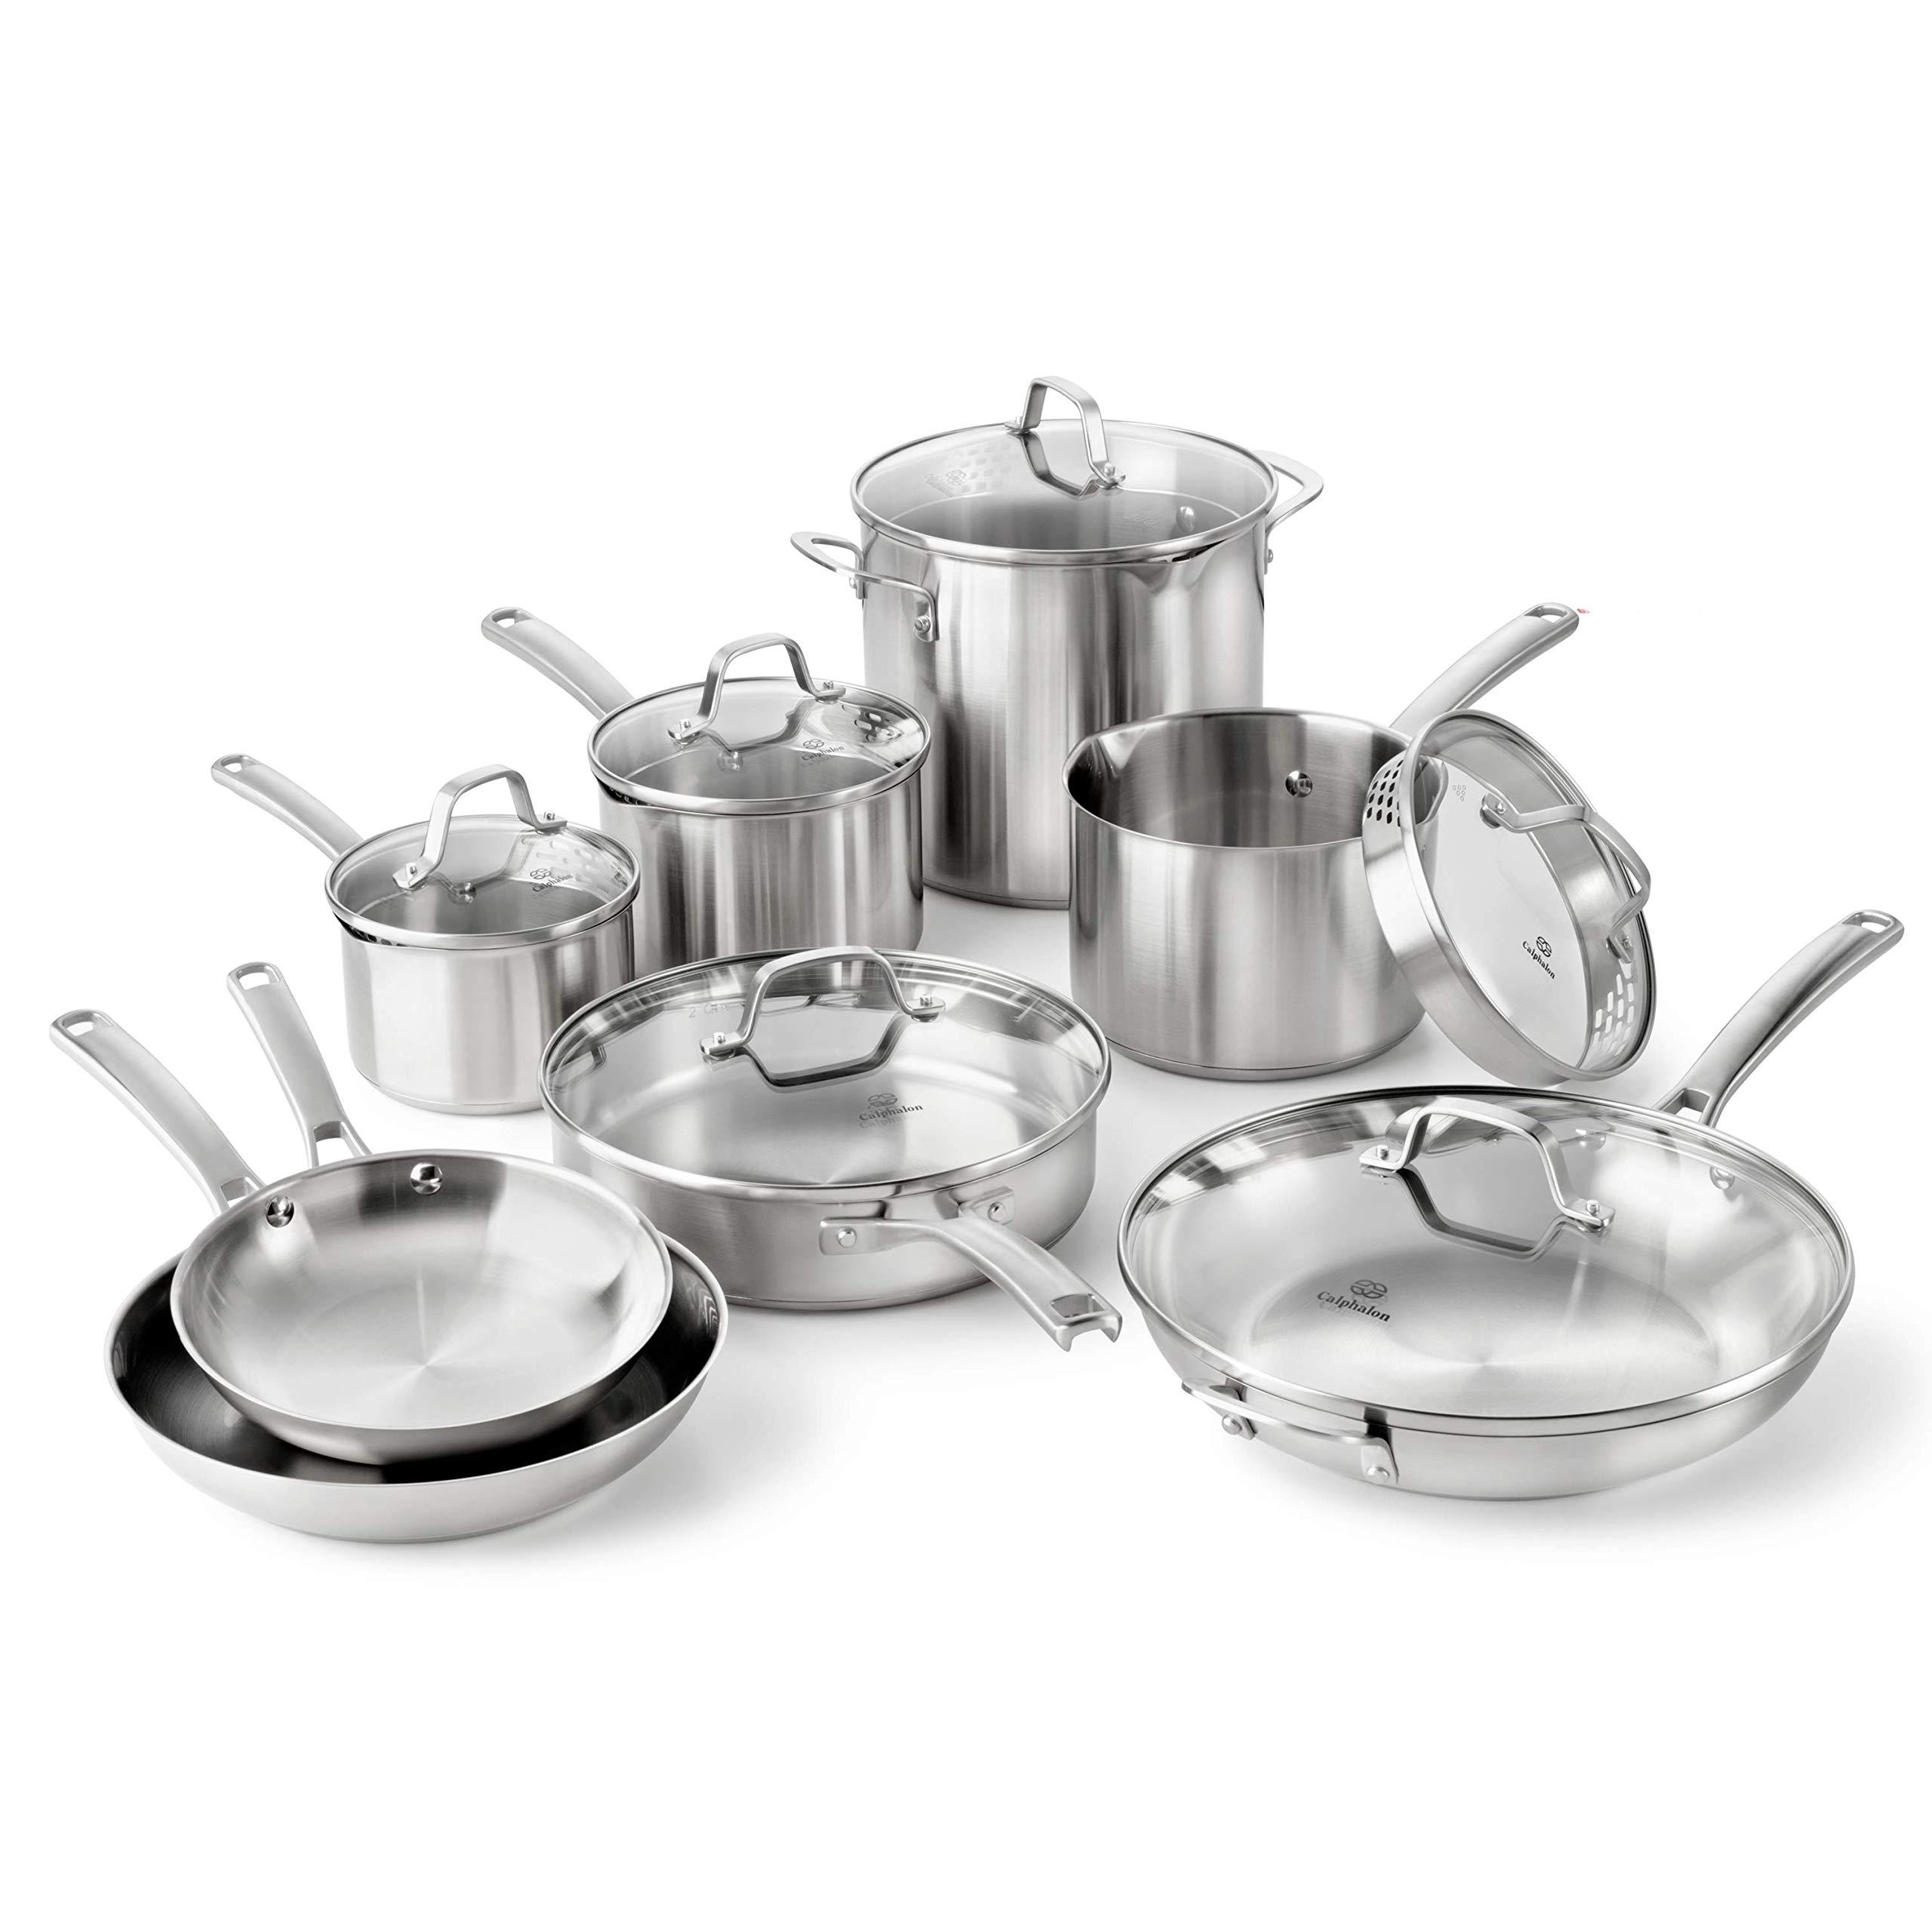 Calphalon Classic Stainless Cookware 14 Piece